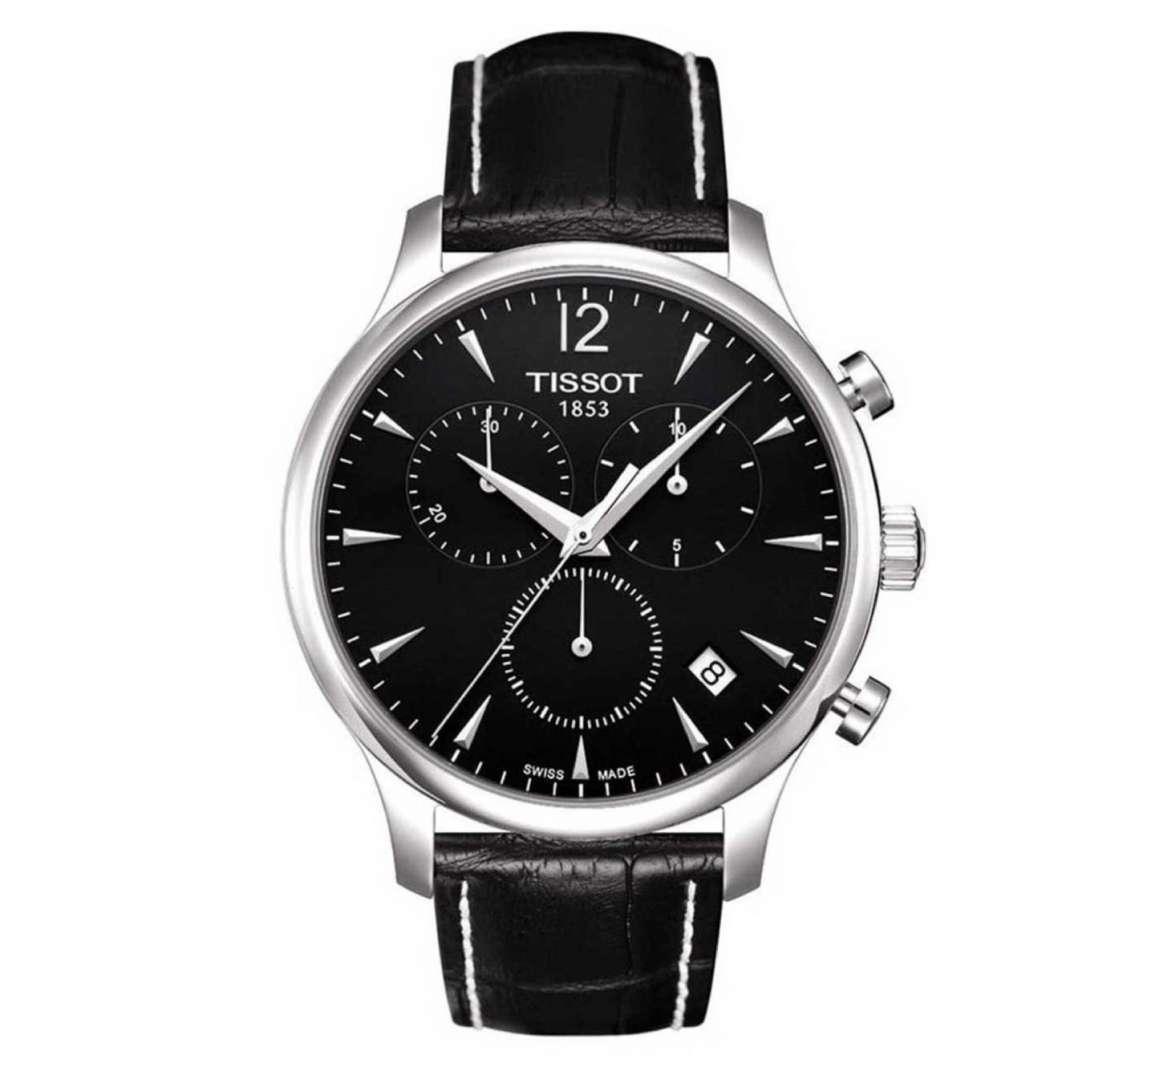 שעון יד אנלוגי tissot t063.617.16.057.00 טיסו